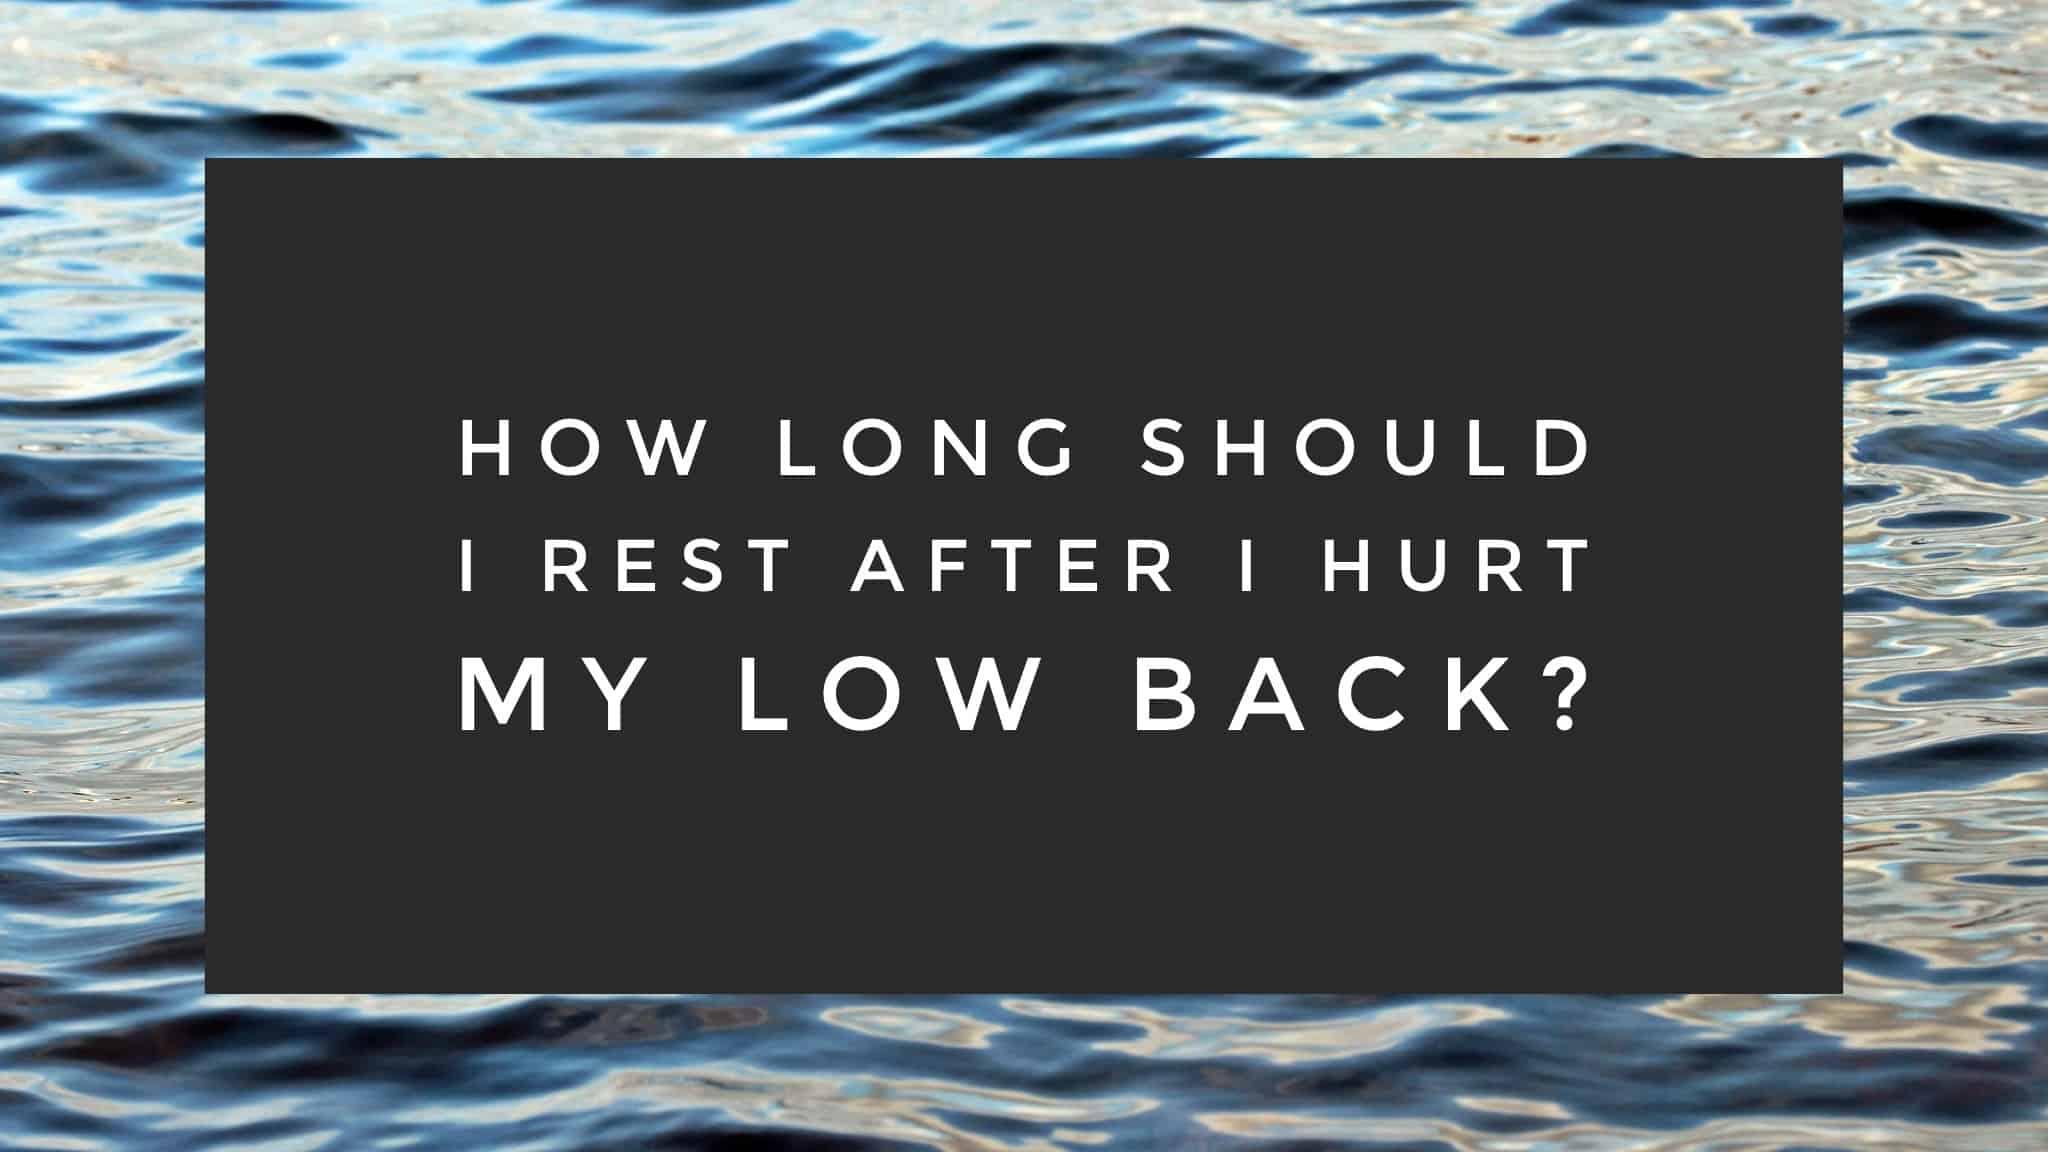 how long should i rest after i hurt my low back